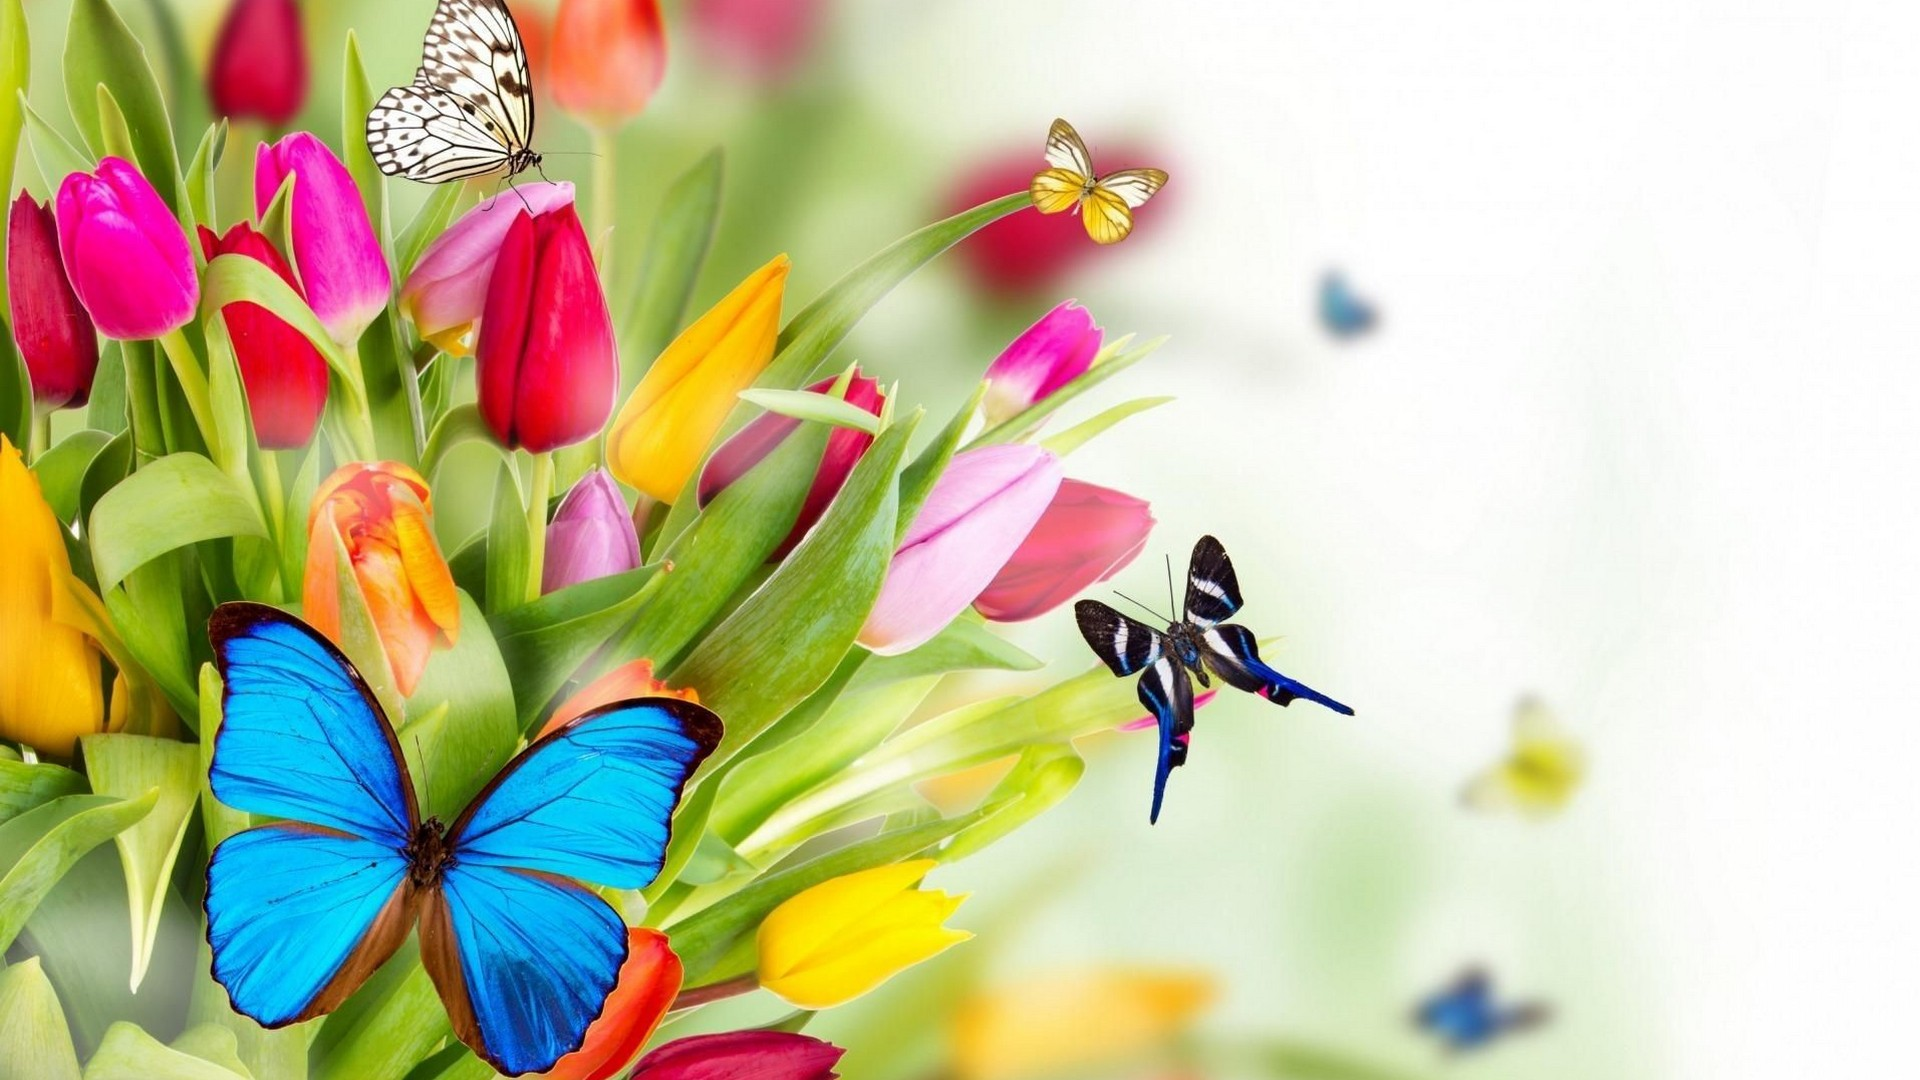 Springtime Desktop Wallpaper - Full Hd Beautiful Flowers - HD Wallpaper